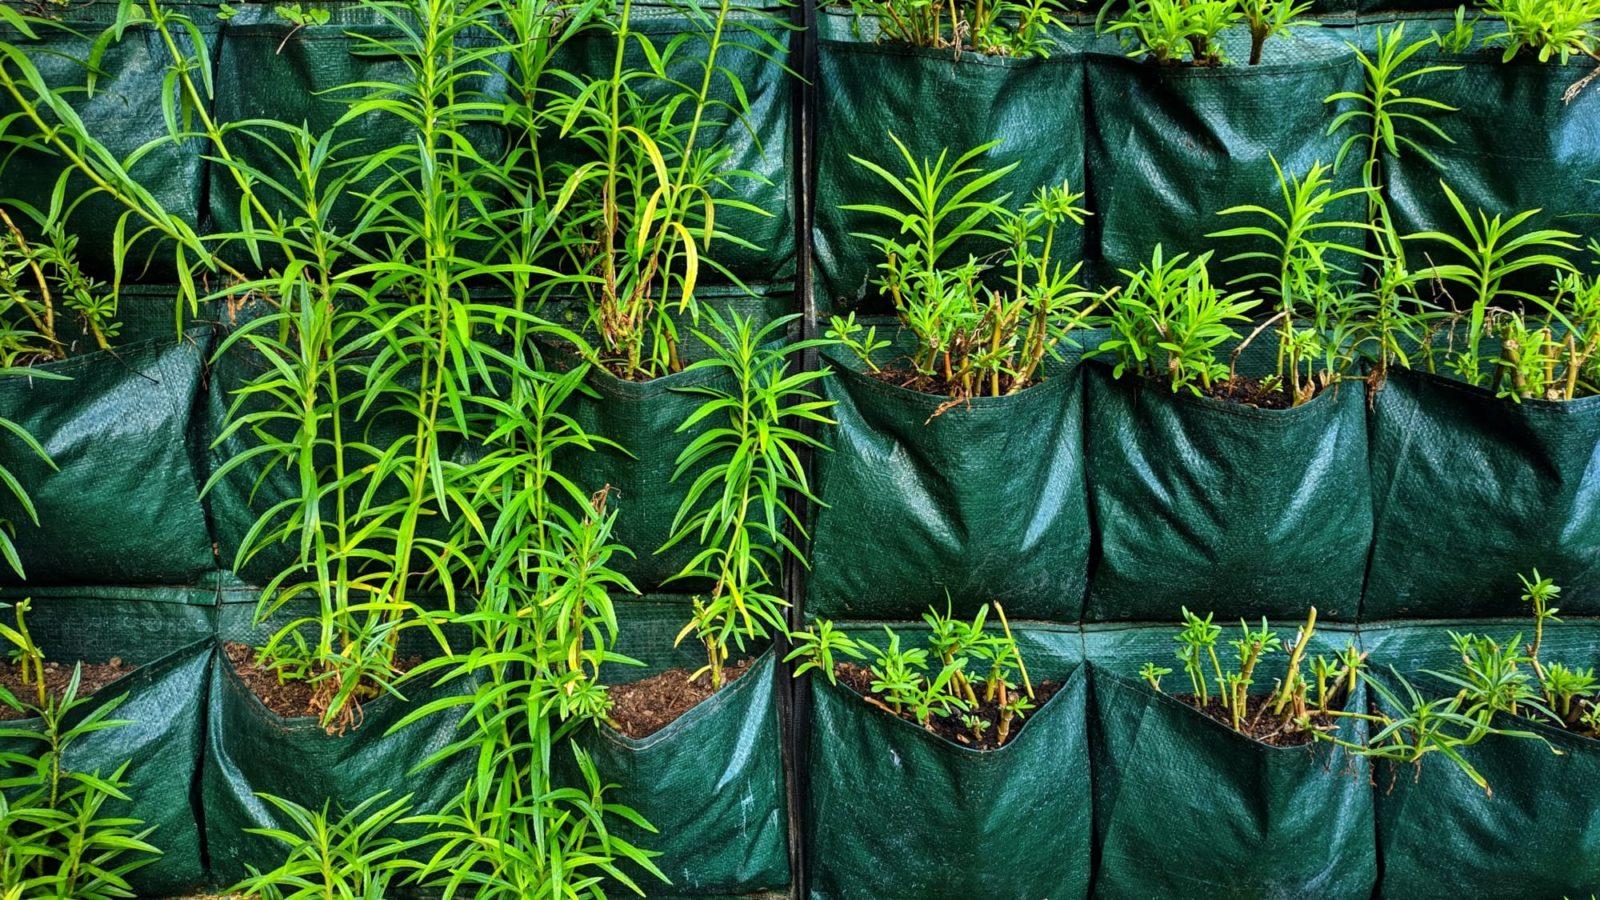 felt growing wall with greenery